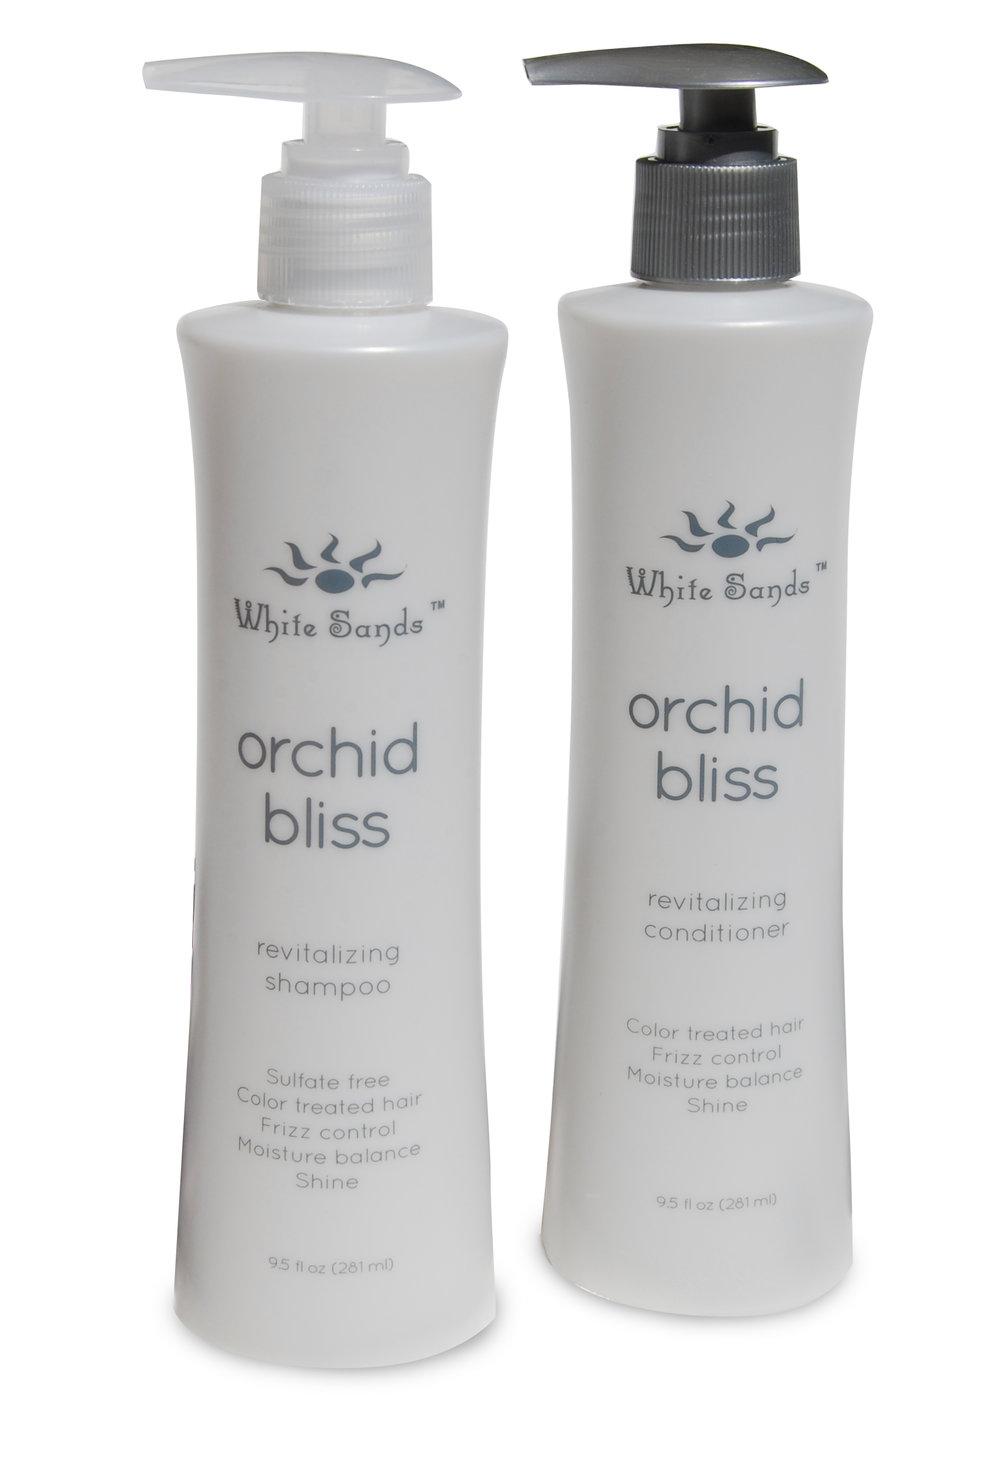 ws_orchid_bliss_10oz_no_bg 2.jpg